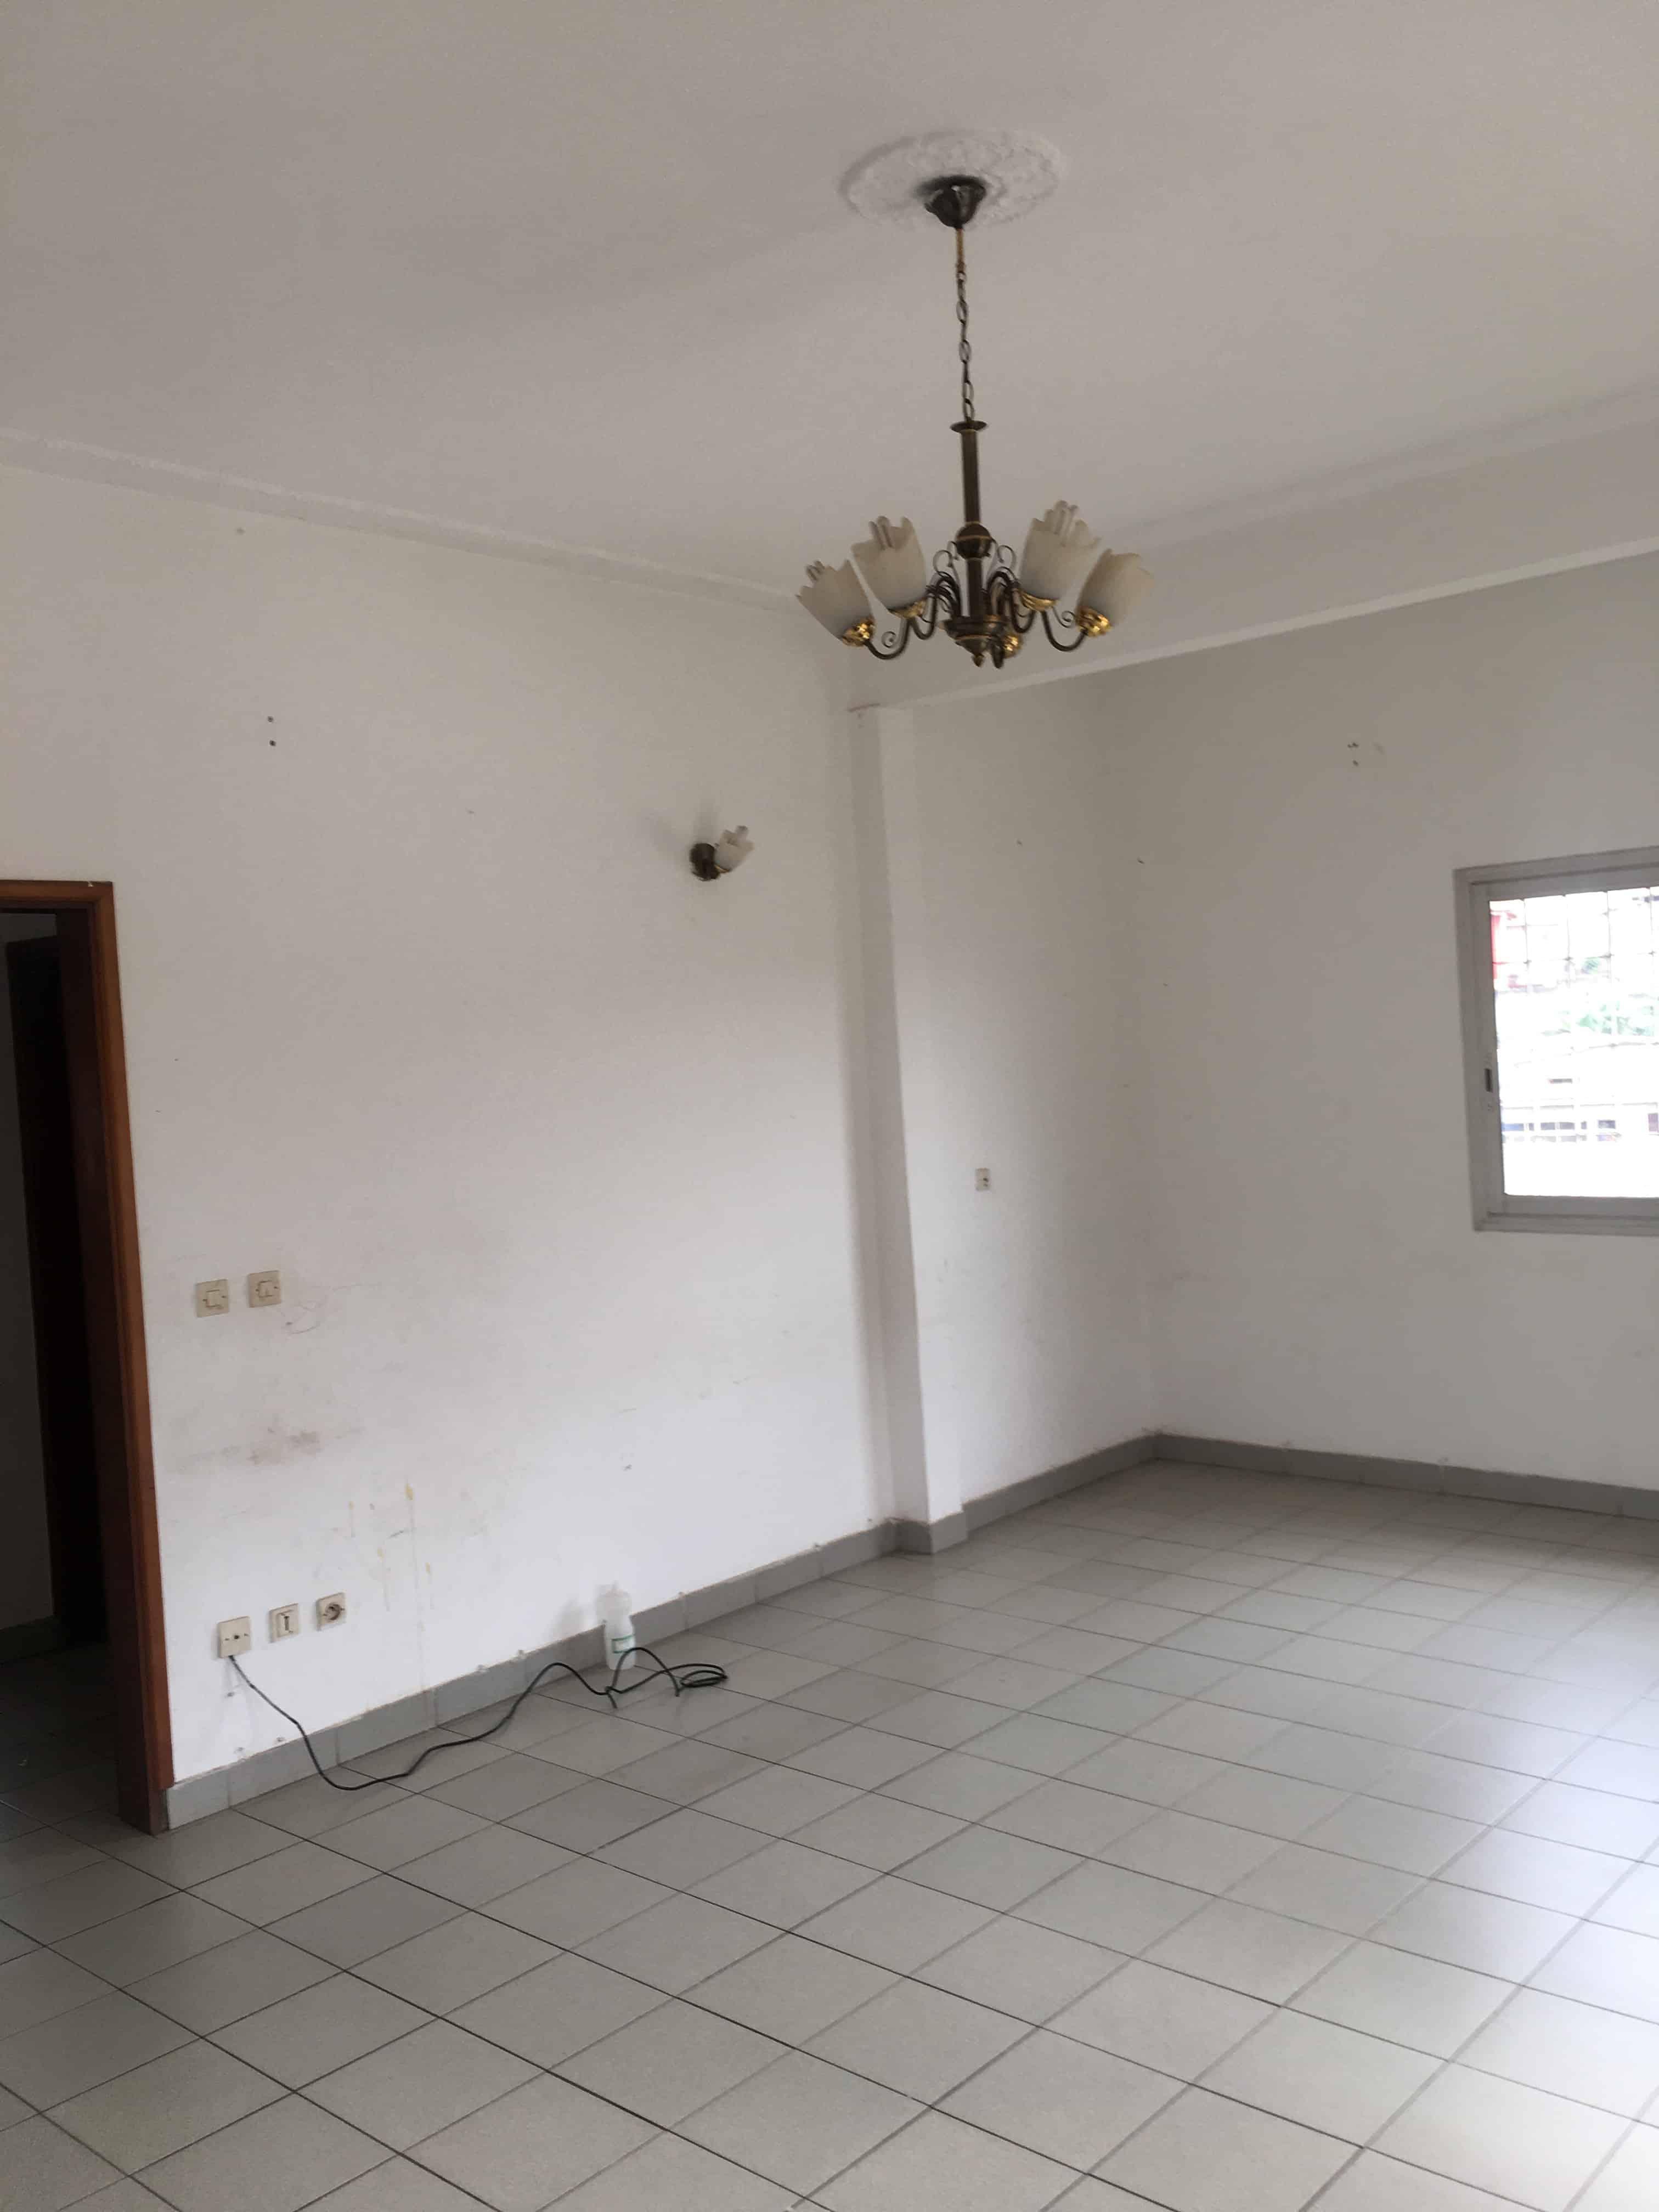 Apartment to rent - Yaoundé, Mfandena, Titi garage - 1 living room(s), 2 bedroom(s), 1 bathroom(s) - 225 000 FCFA / month